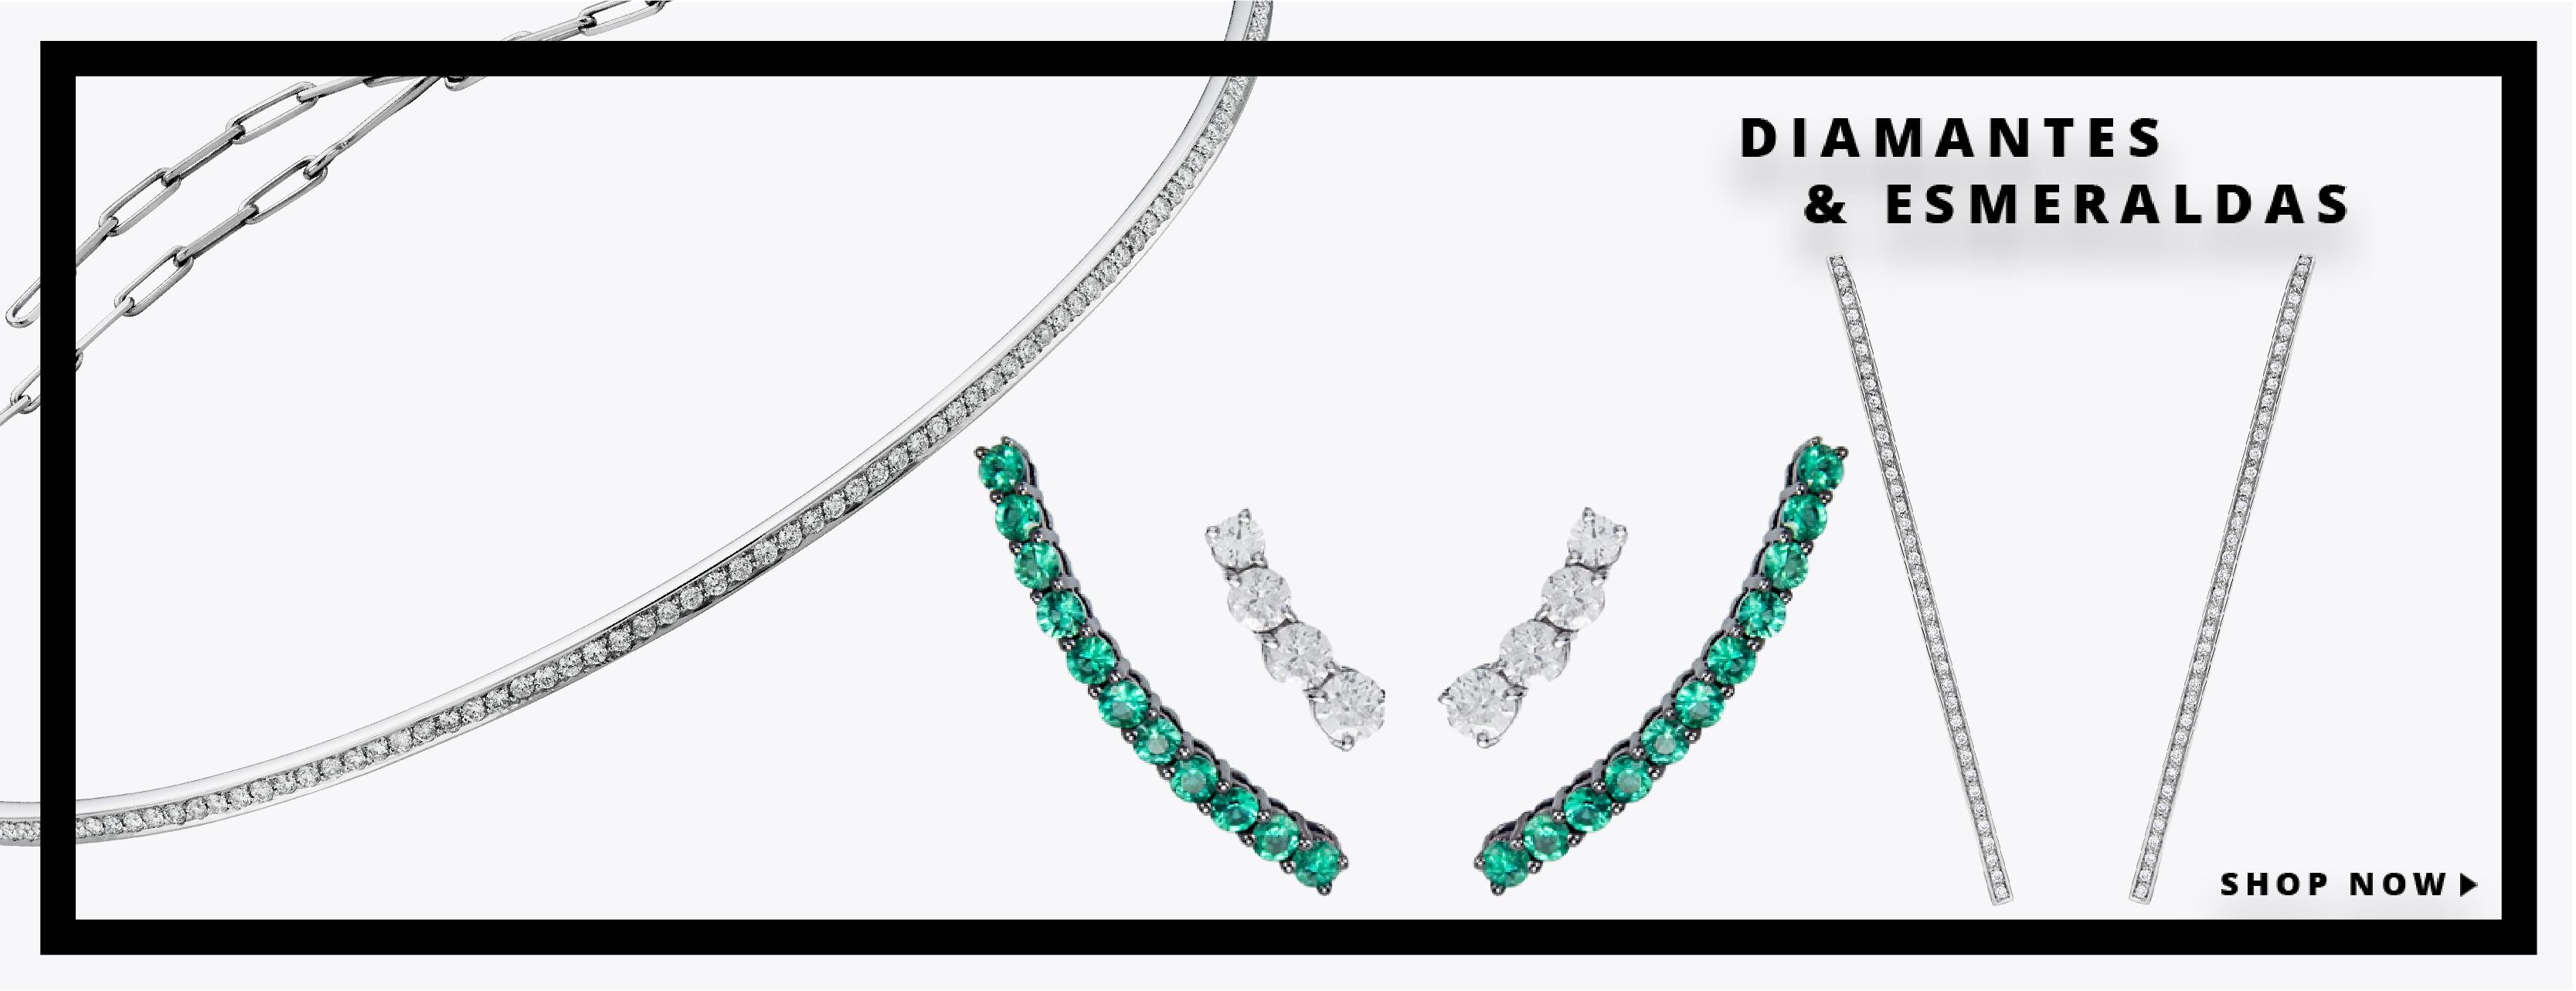 Diamantes e esmeraldas